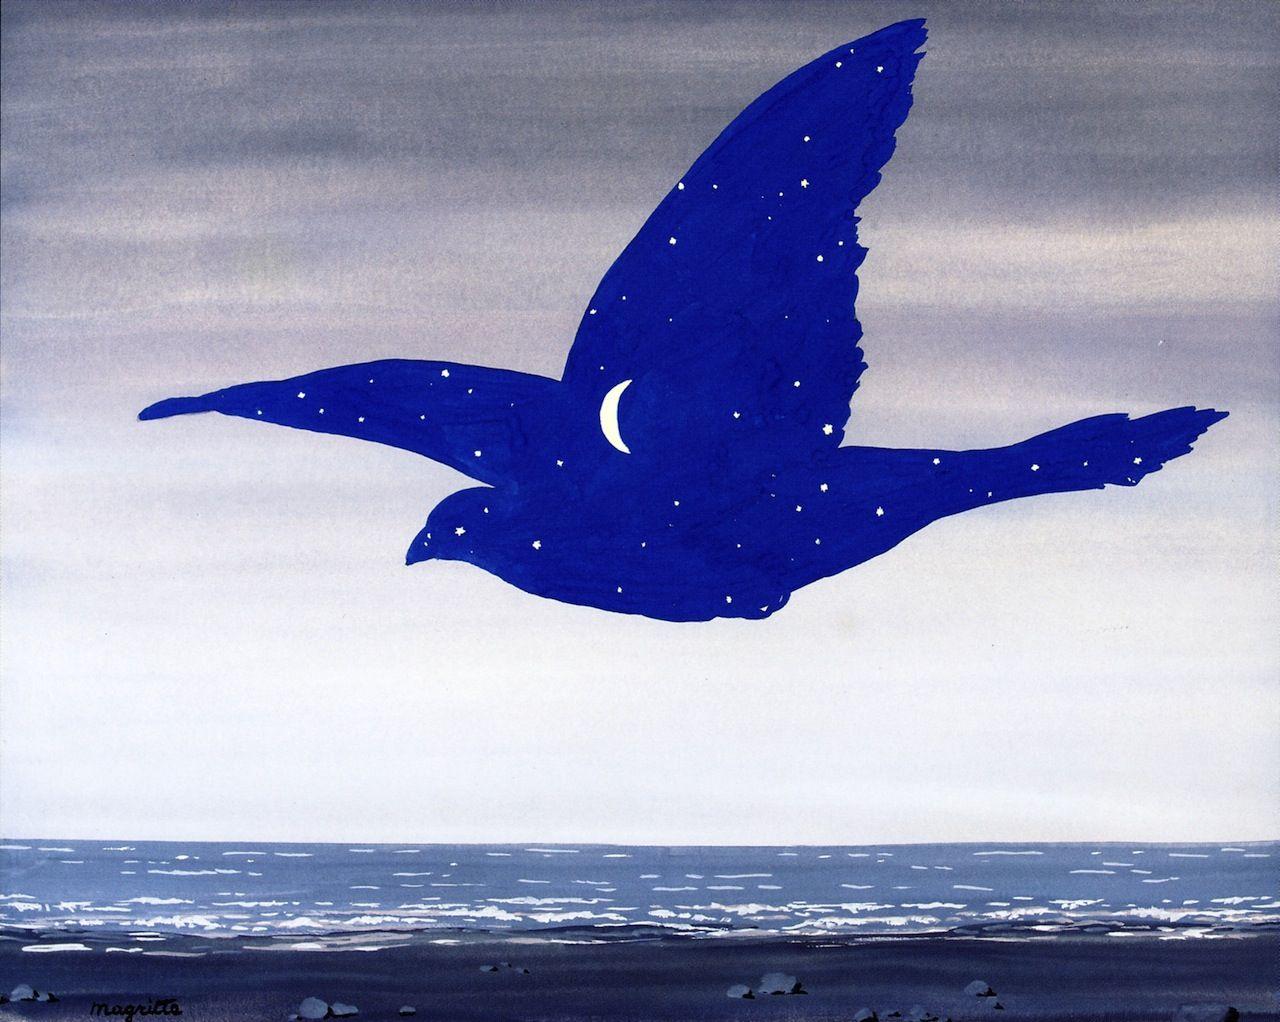 Le Baiserrene Magritte Circa 1957 Rene De Magritte Produccion Artistica Magritte